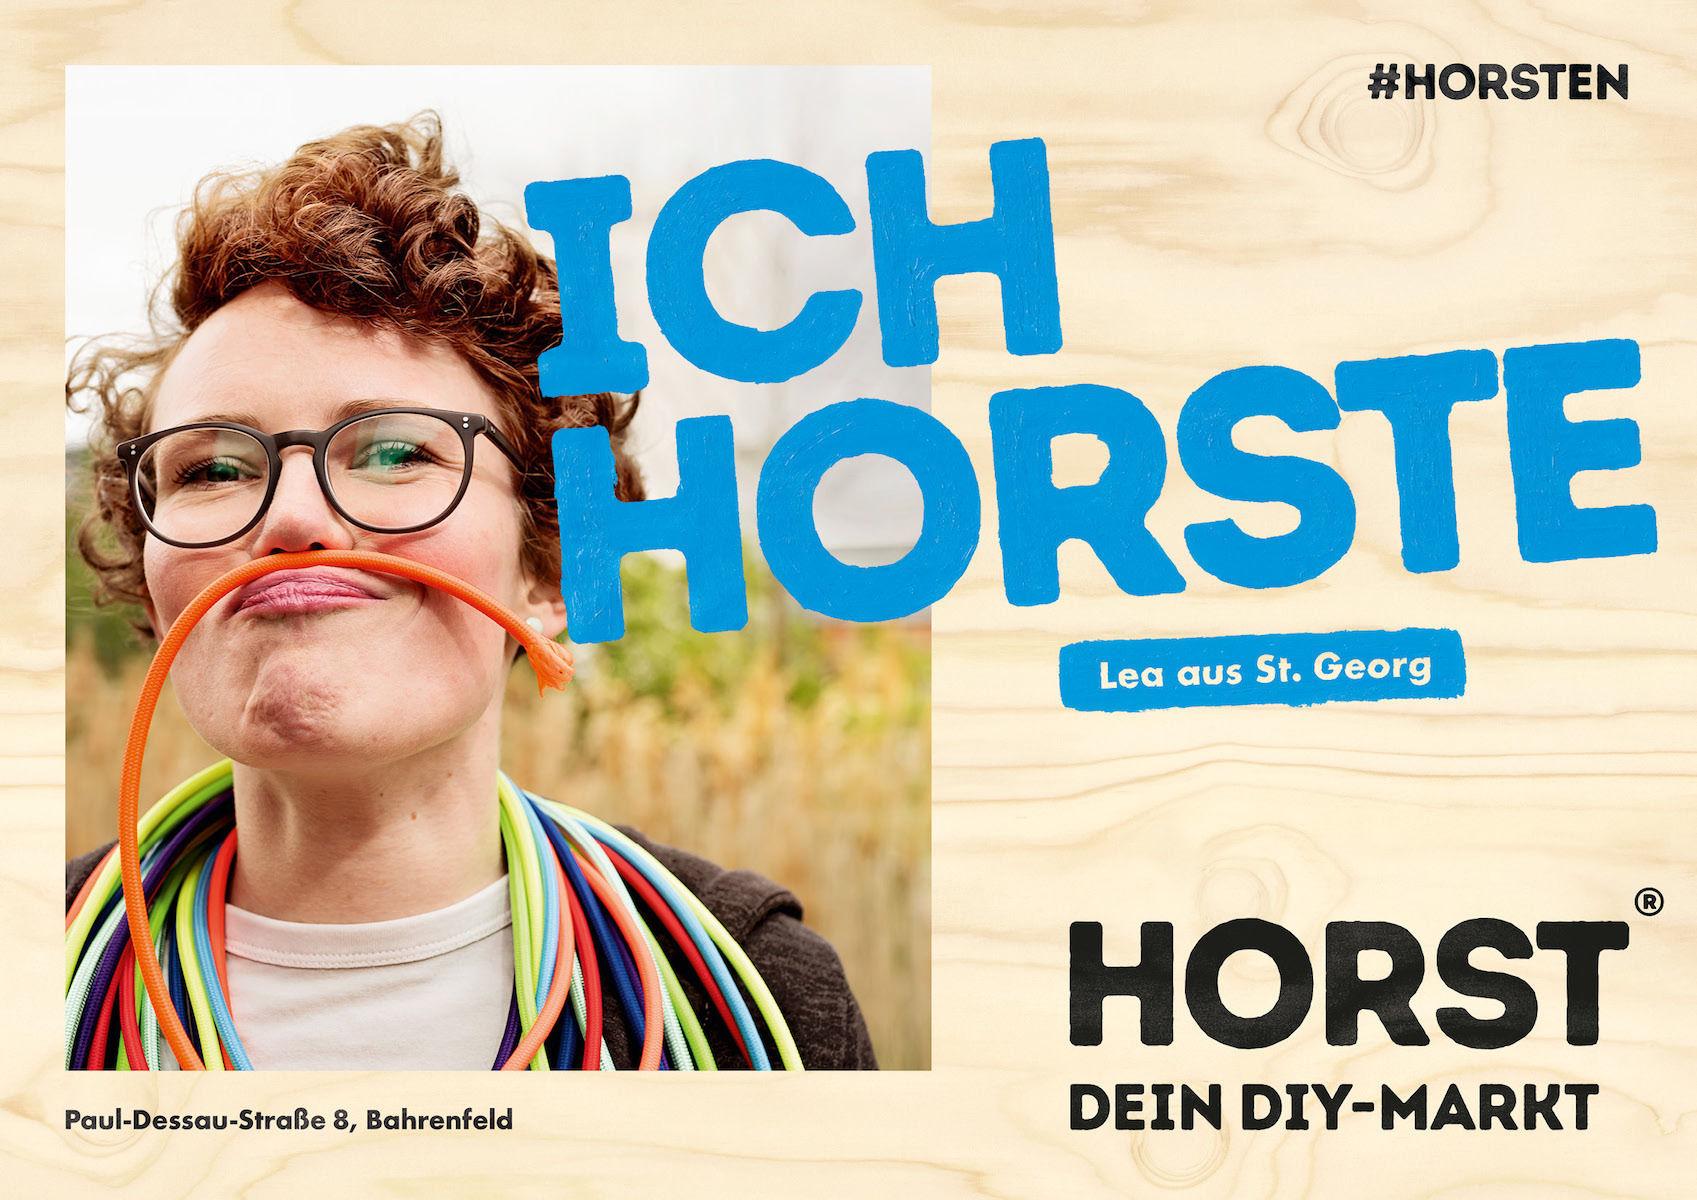 WILDFOX RUNNING: Johannes Knuth for HORST Eröffnungskampagne